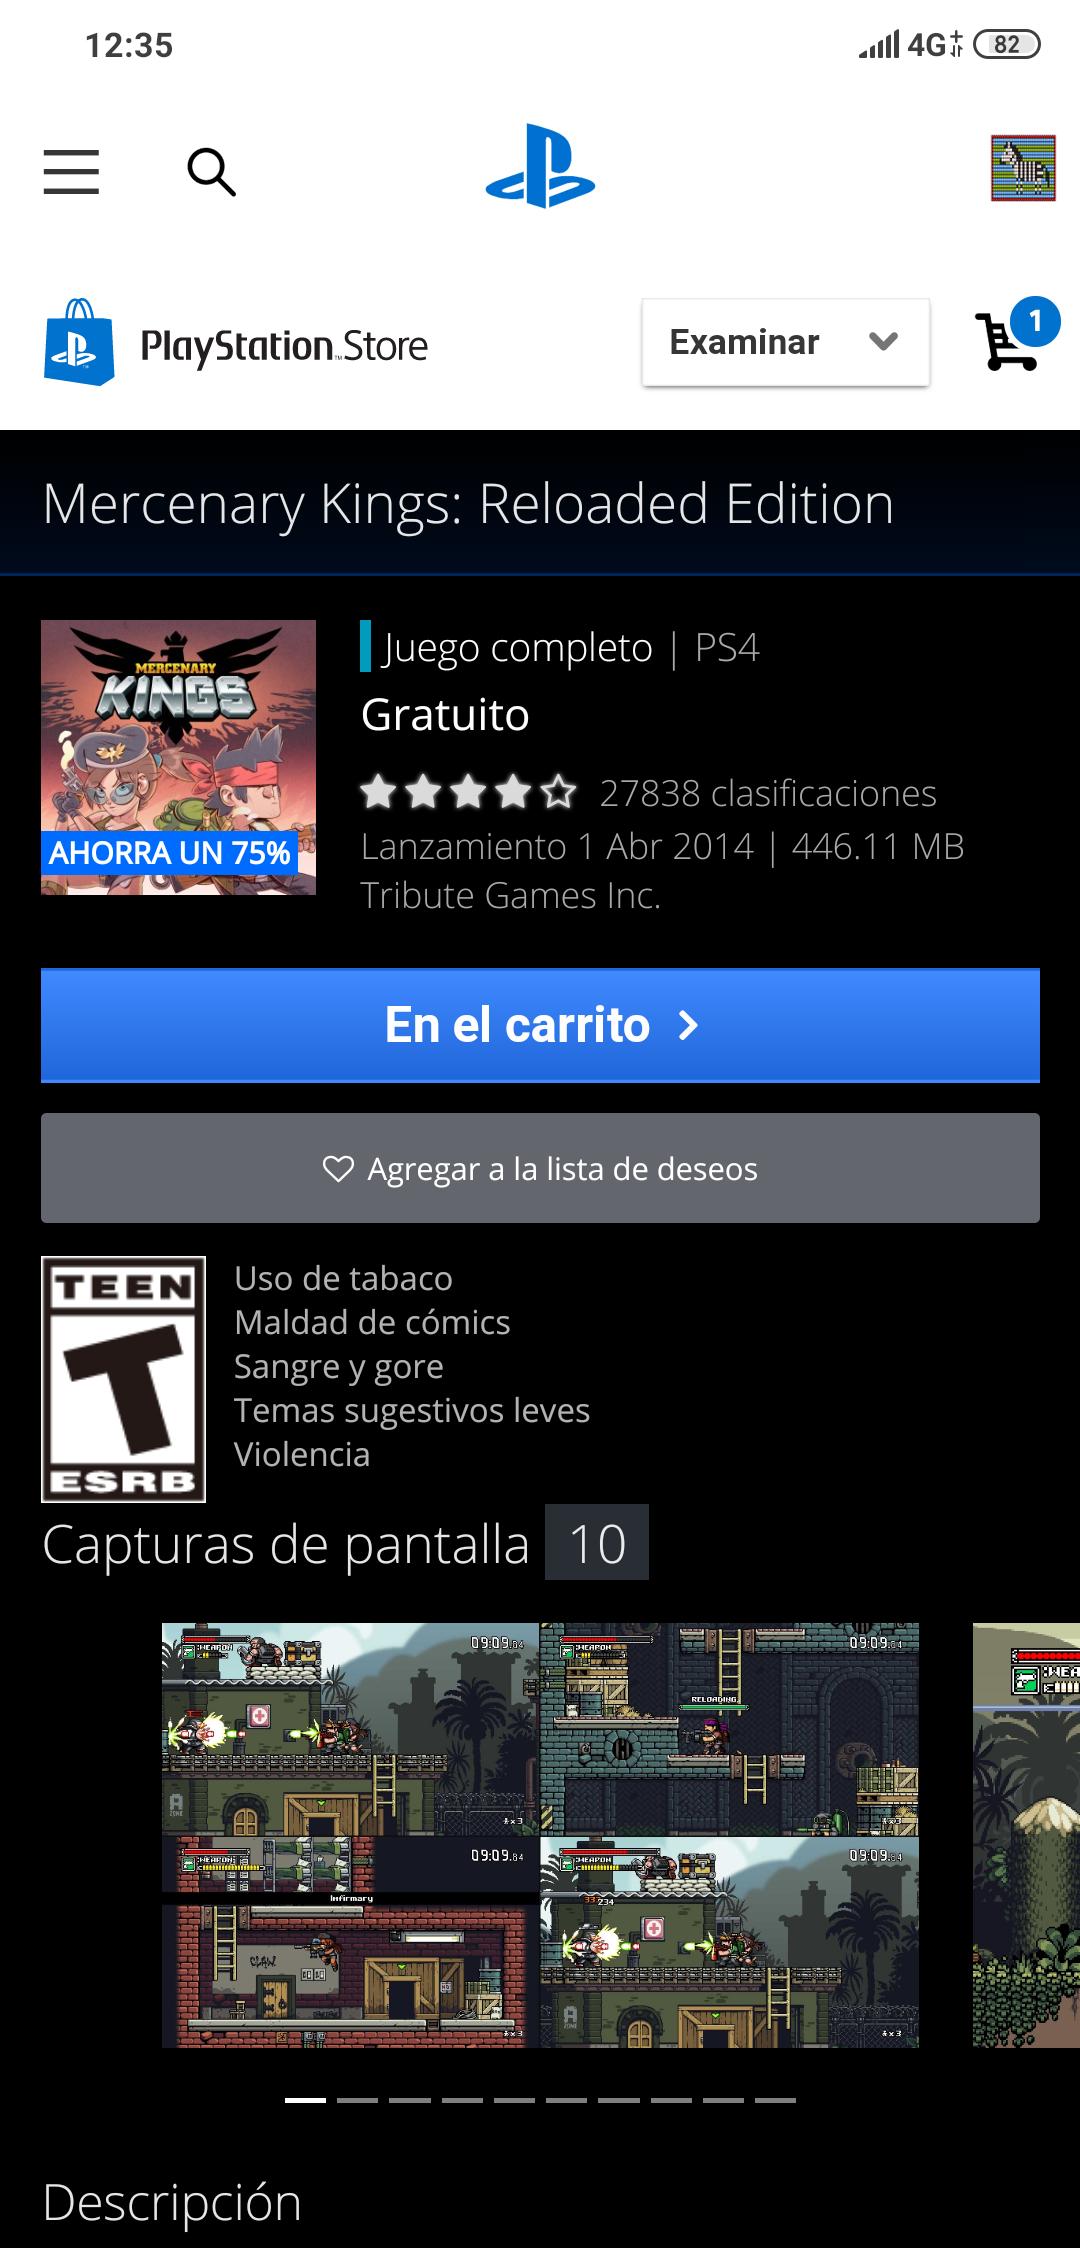 Mercenary Kings: Reloaded Edition Gratis PS4